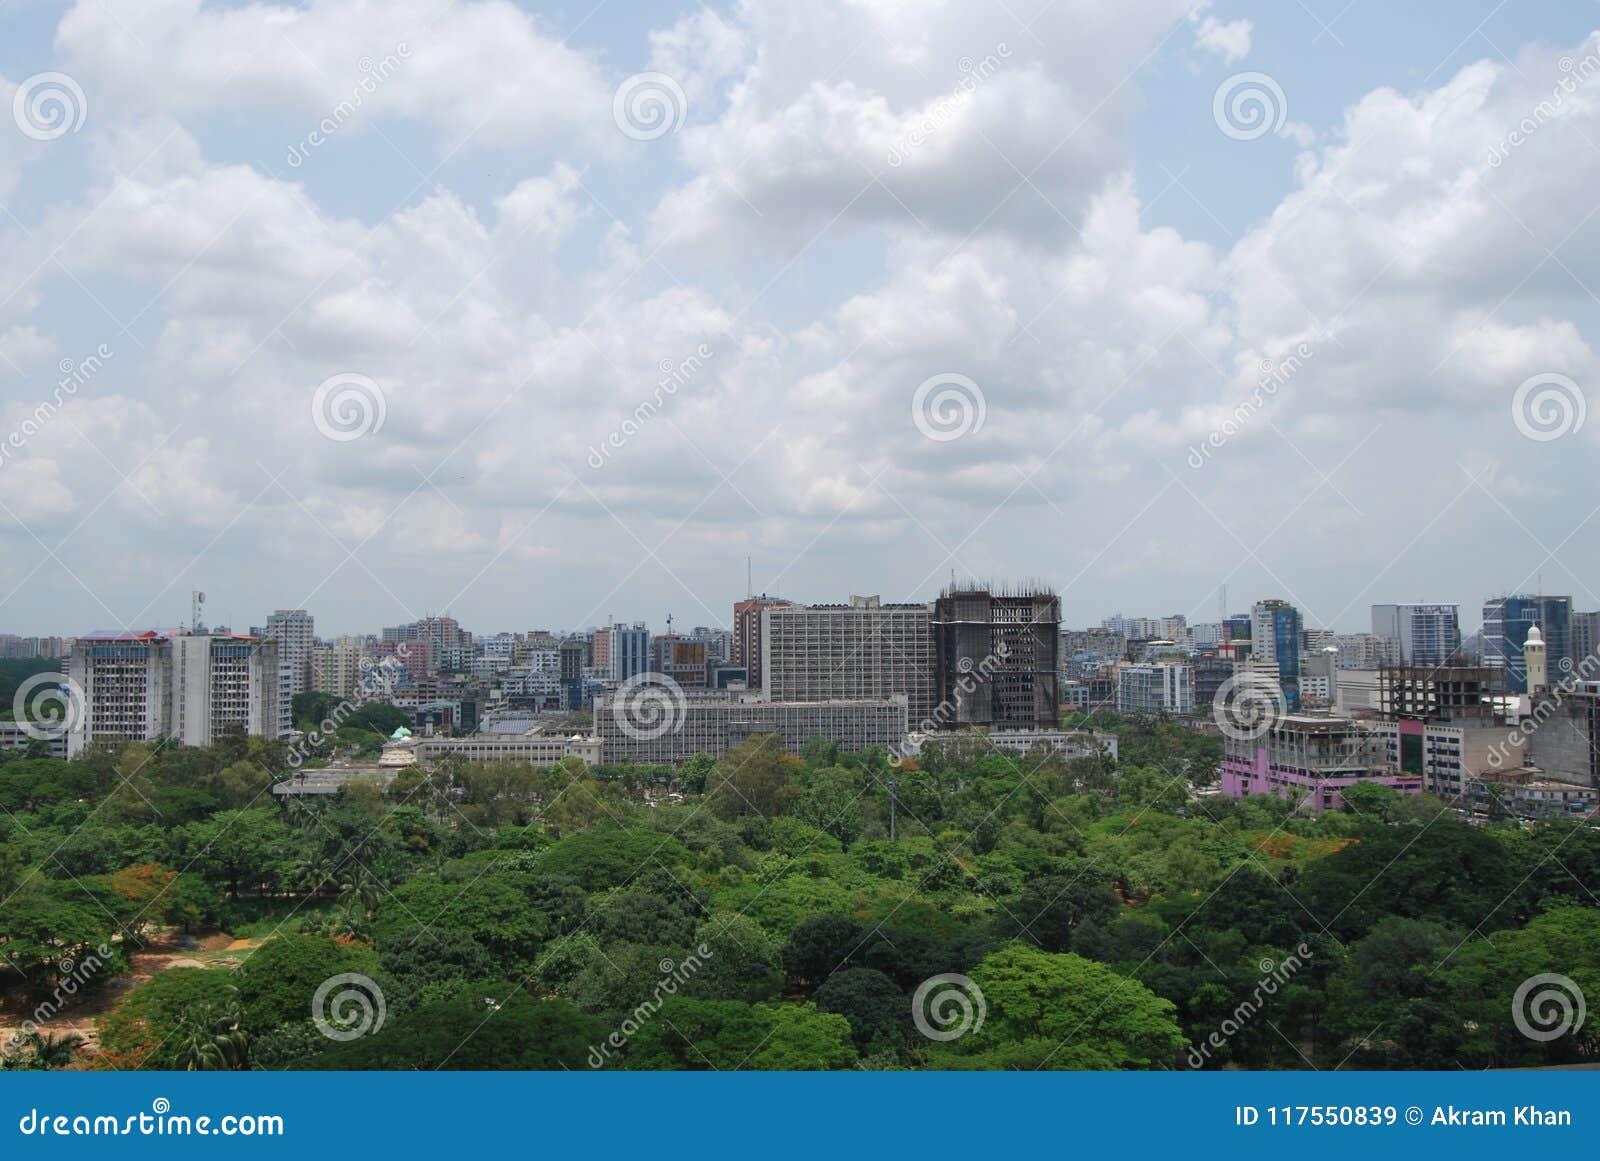 SECRETARIAAT VAN DHAKA-STAD BANGLADESH